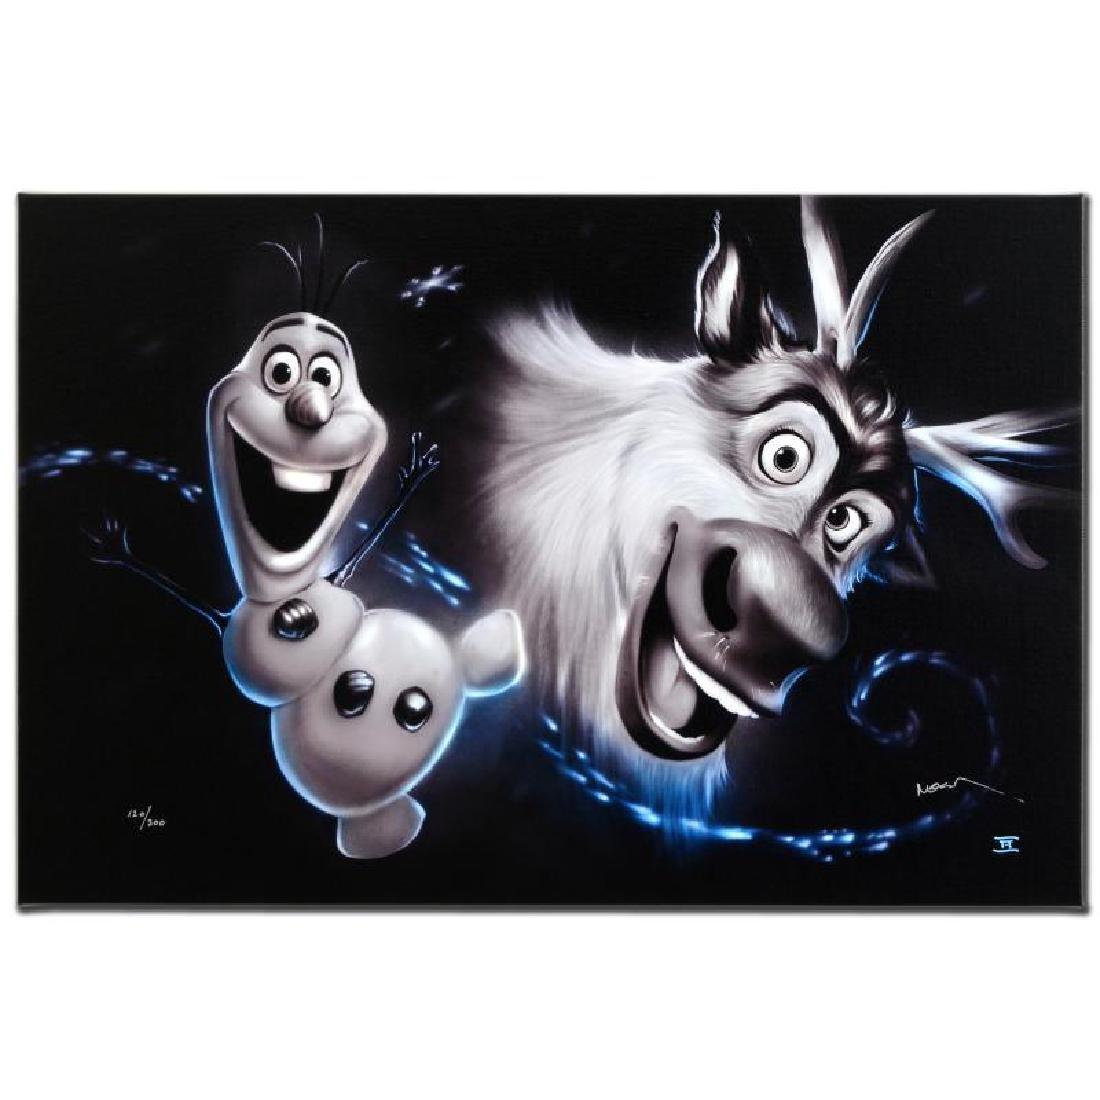 Olaf & Sven by Noah - 3